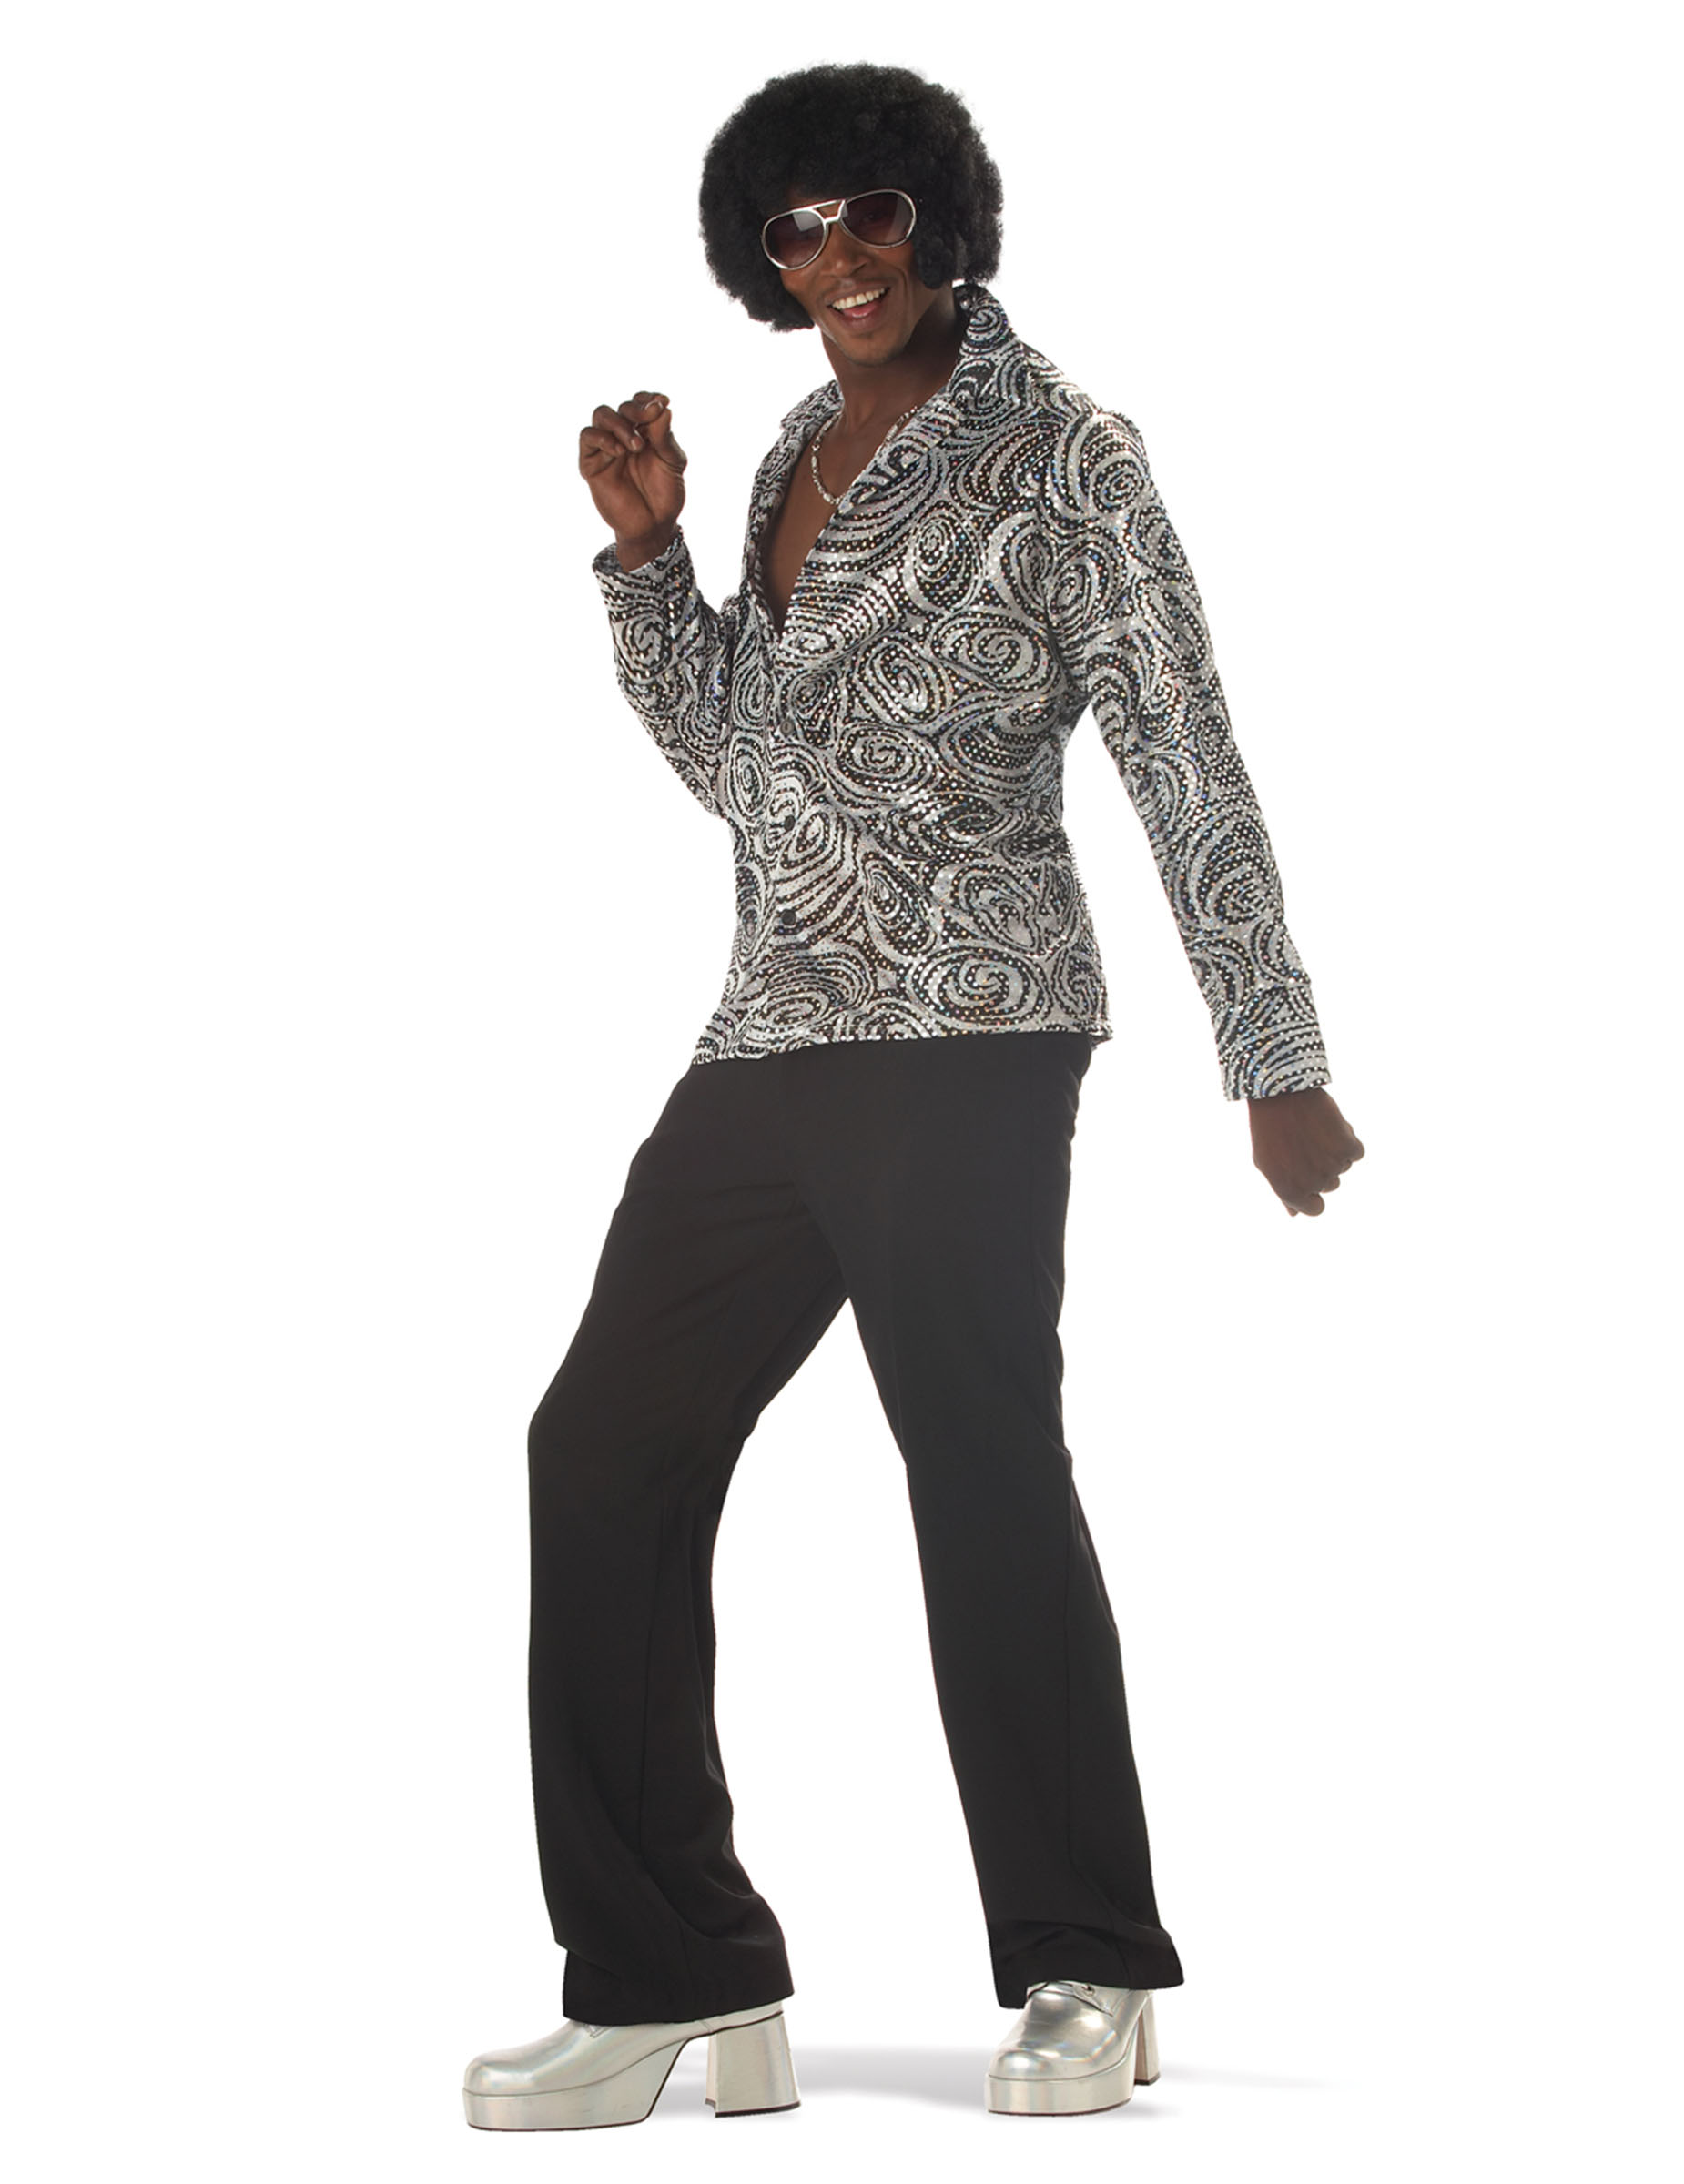 70er jahre disco schlagermove outfit f r erwachsene. Black Bedroom Furniture Sets. Home Design Ideas